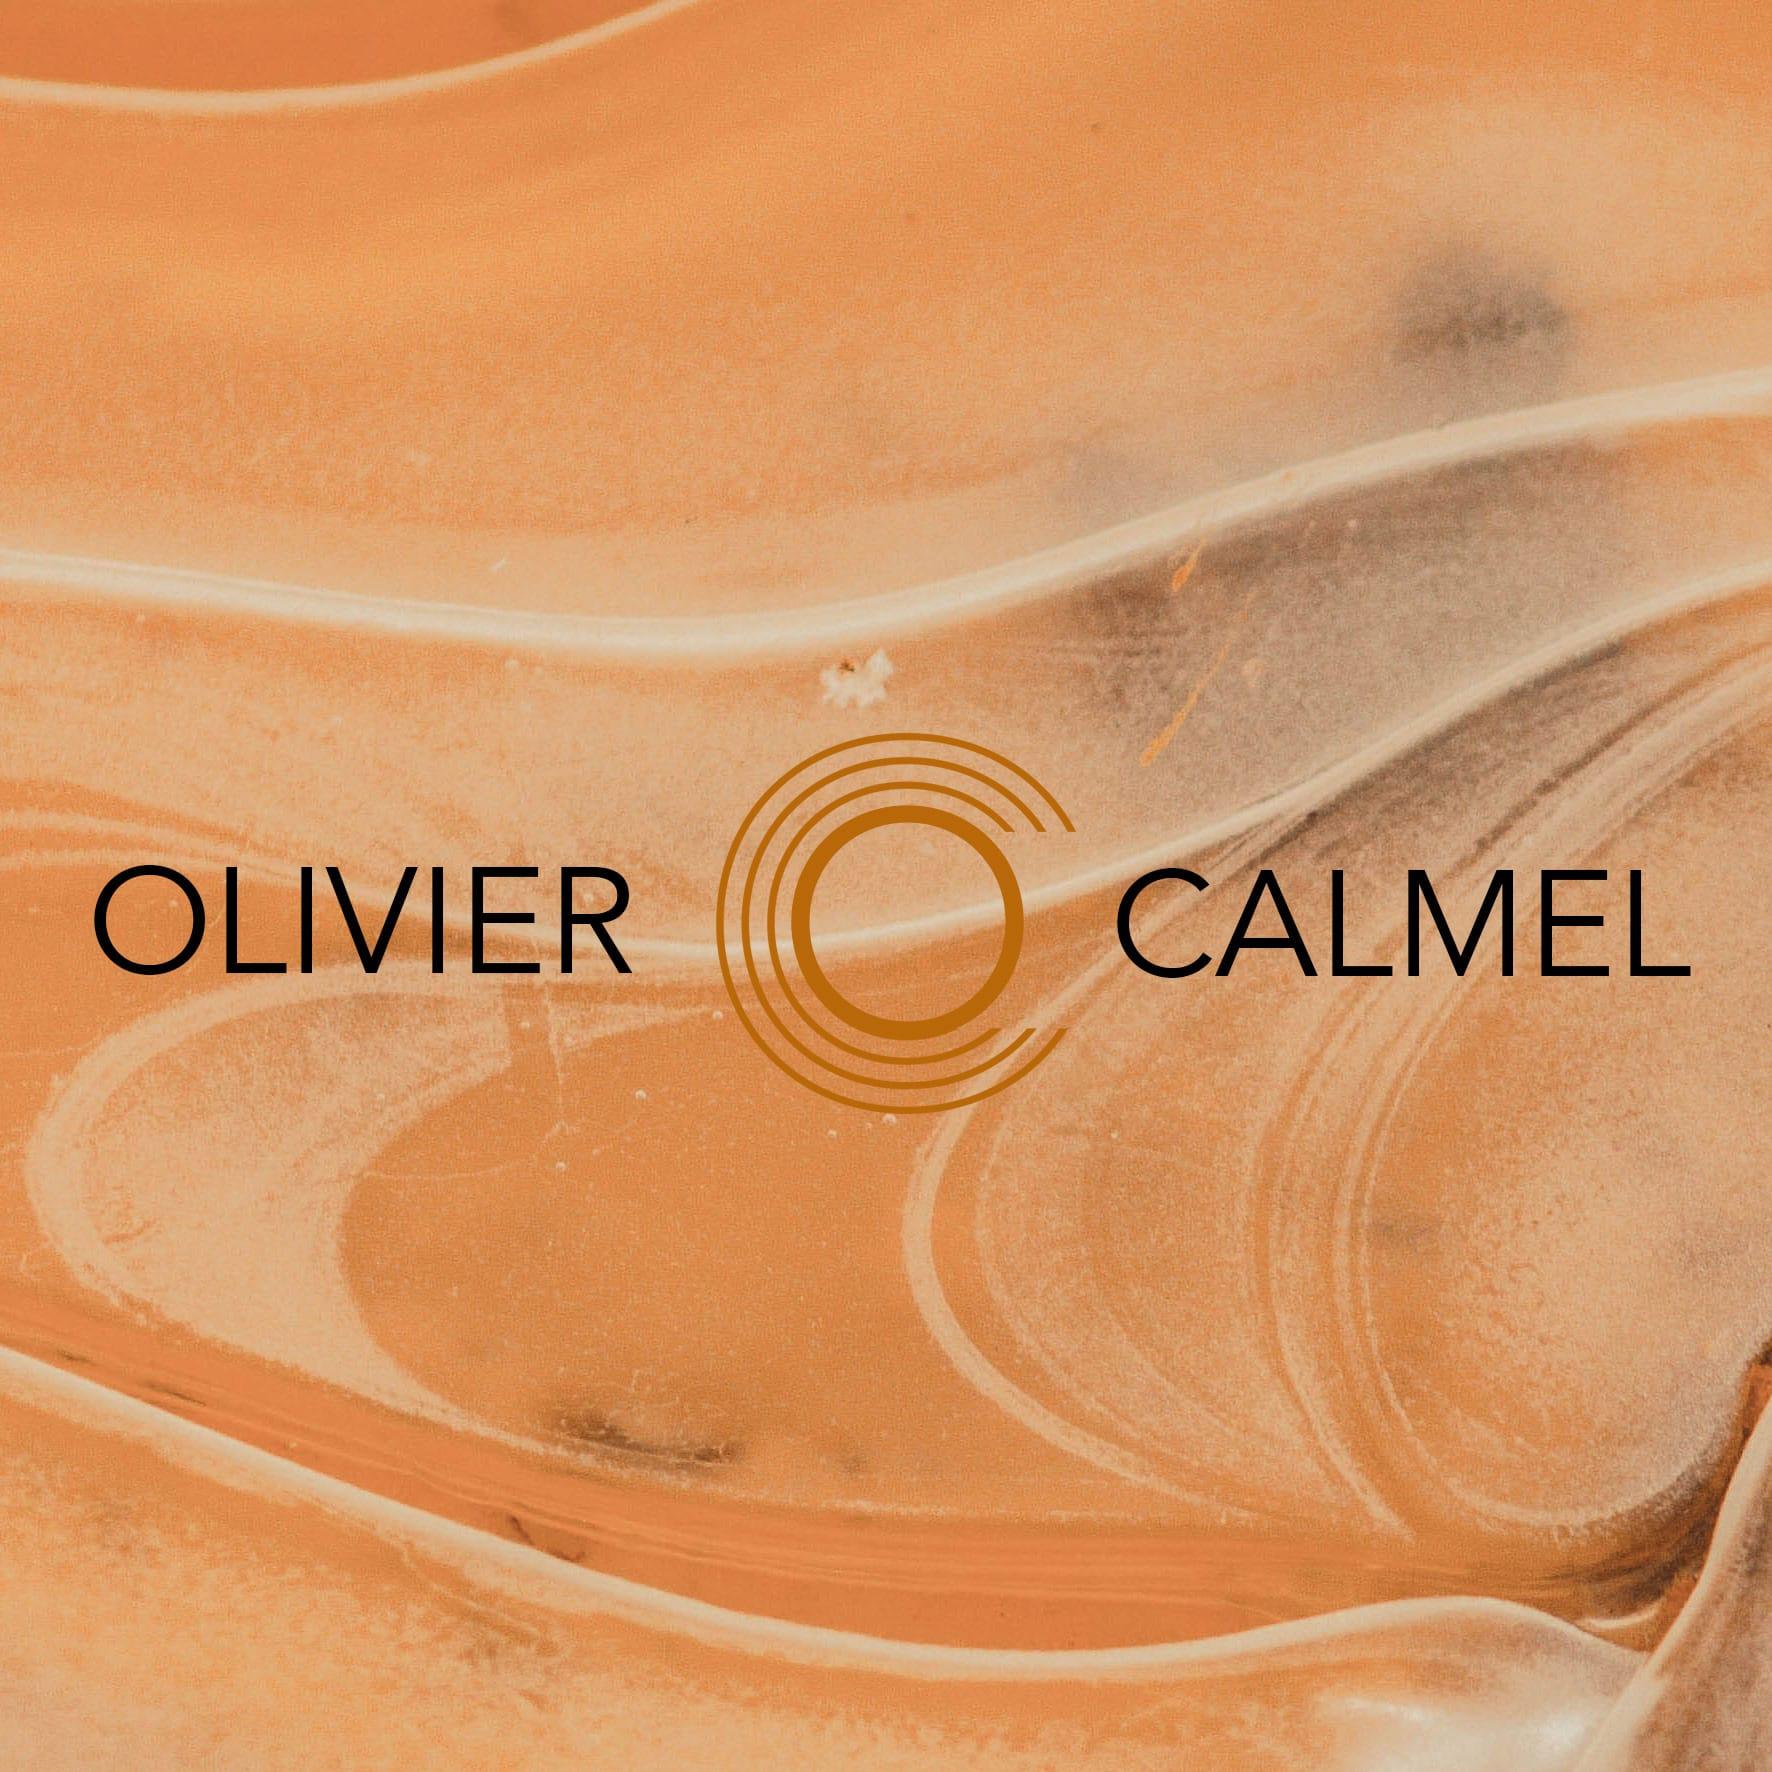 olivier-calmel-logo